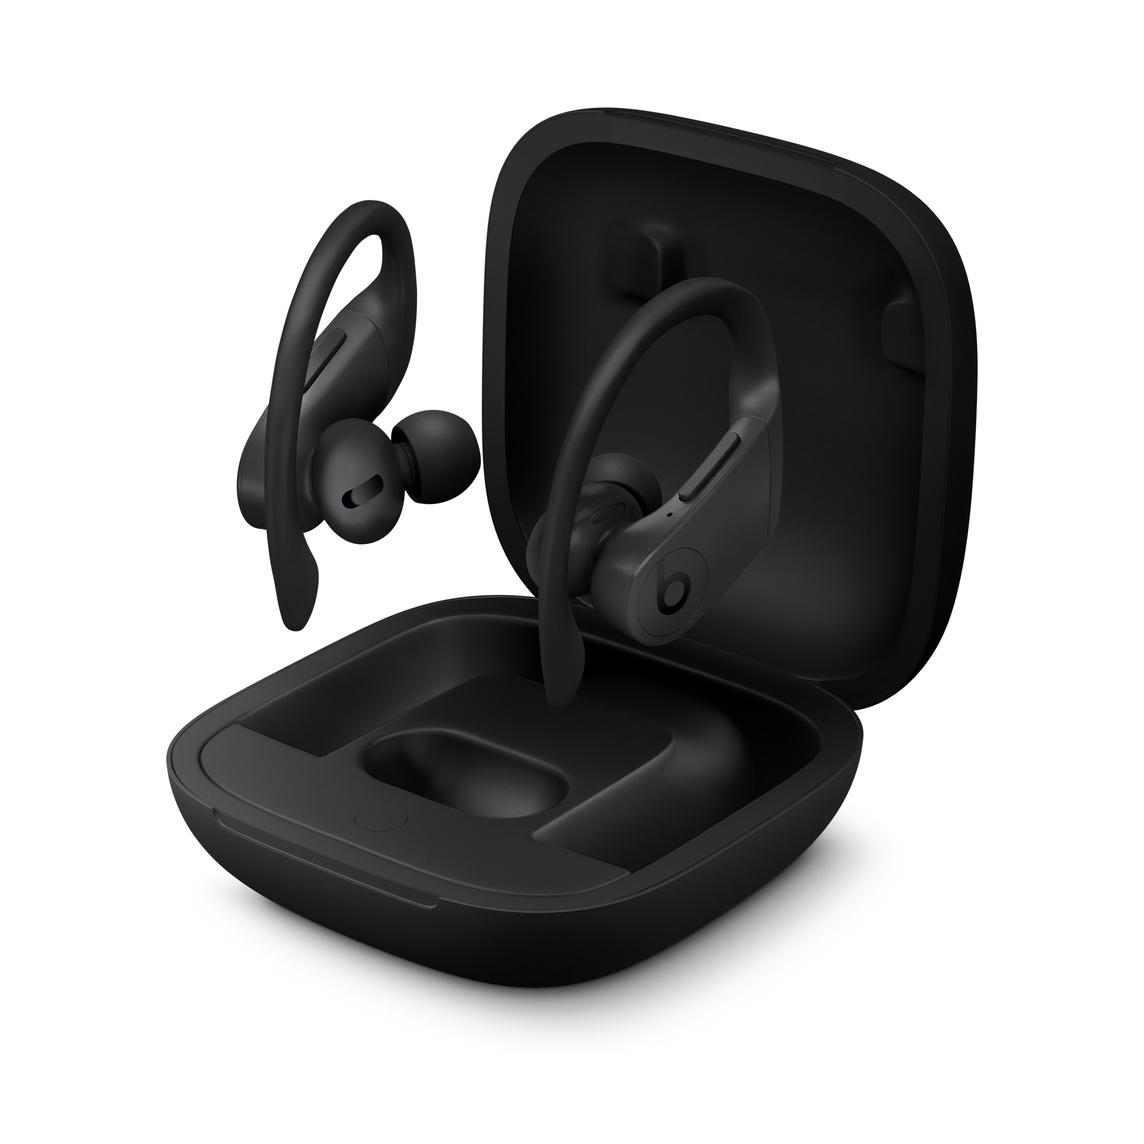 Audifonos Inalambricos Powerbeats Pro Totally Wireless Negro